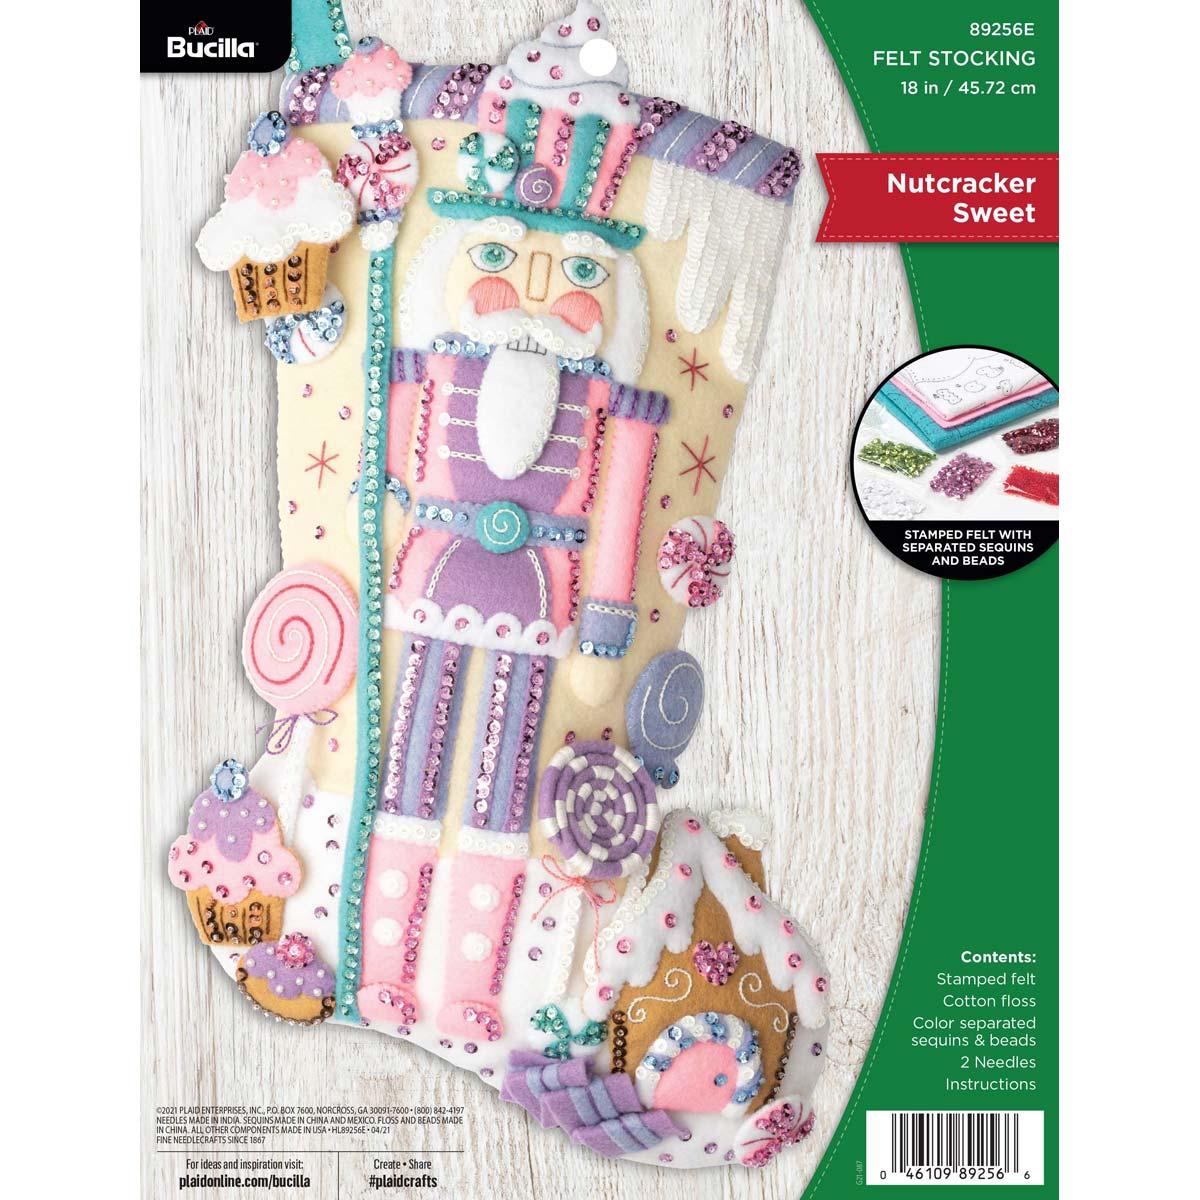 Bucilla ® Seasonal - Felt - Stocking Kits - Nutcracker Sweet - 89256E